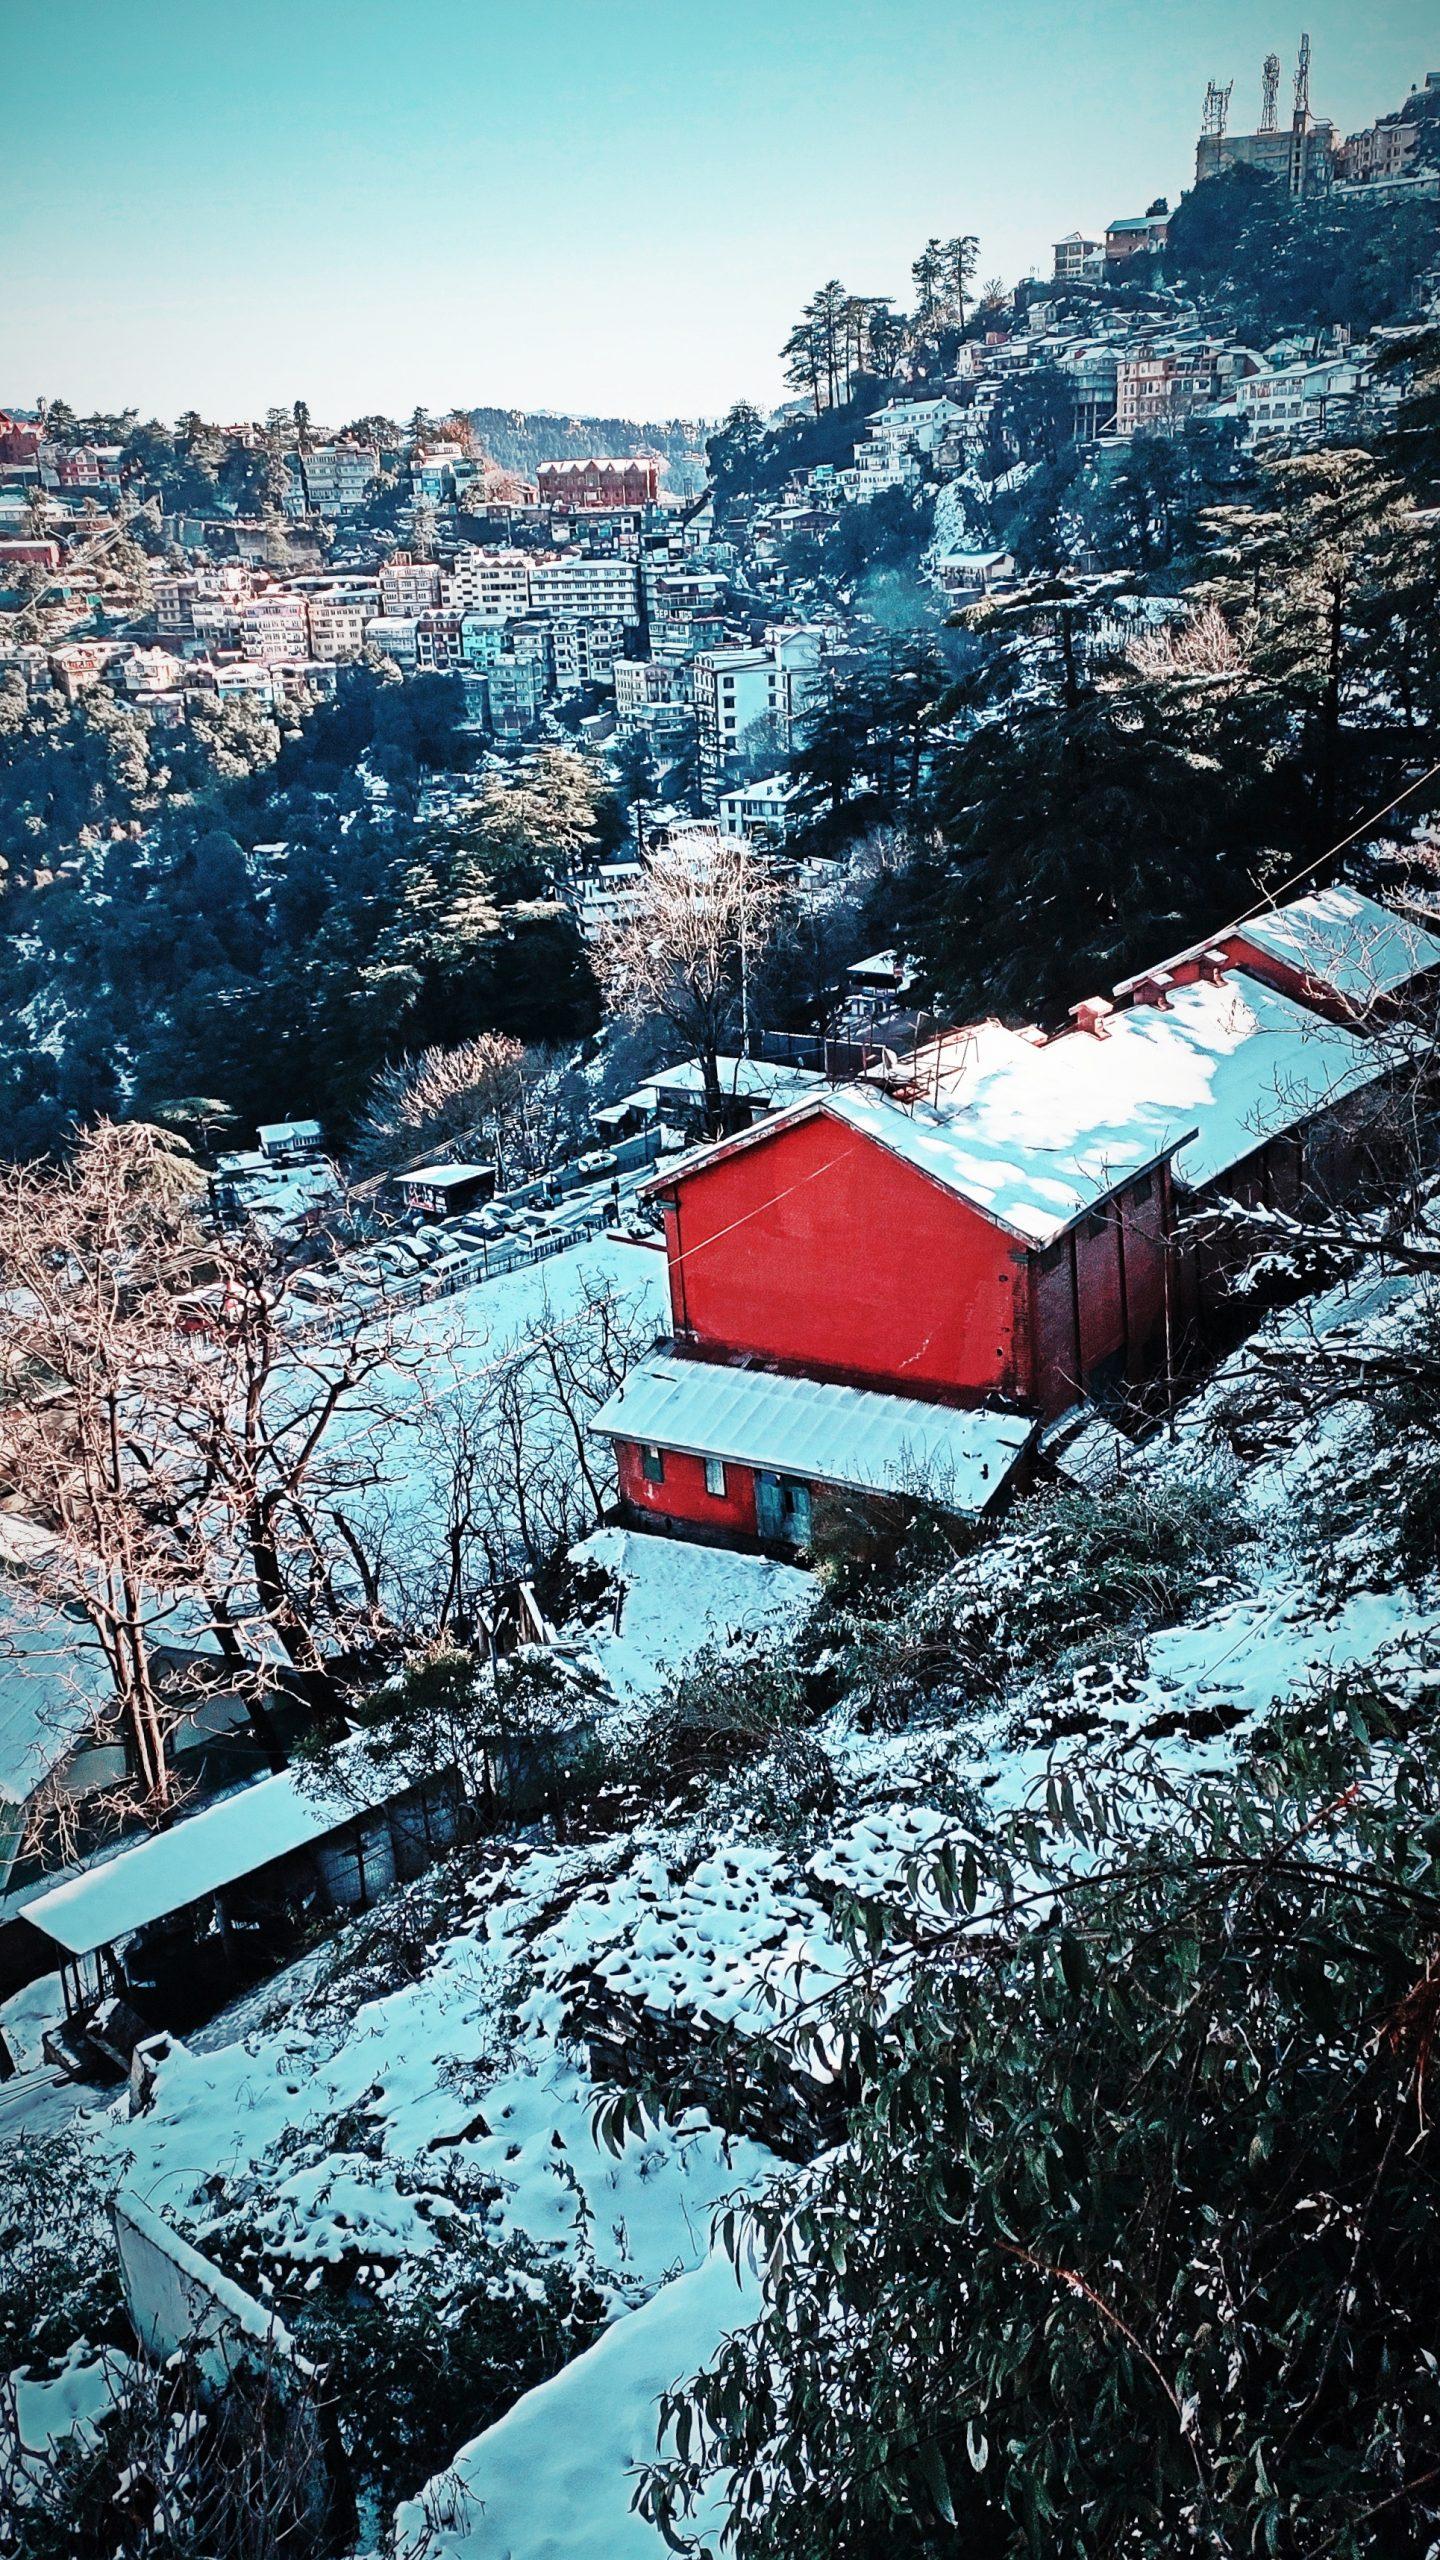 Top shot of a village